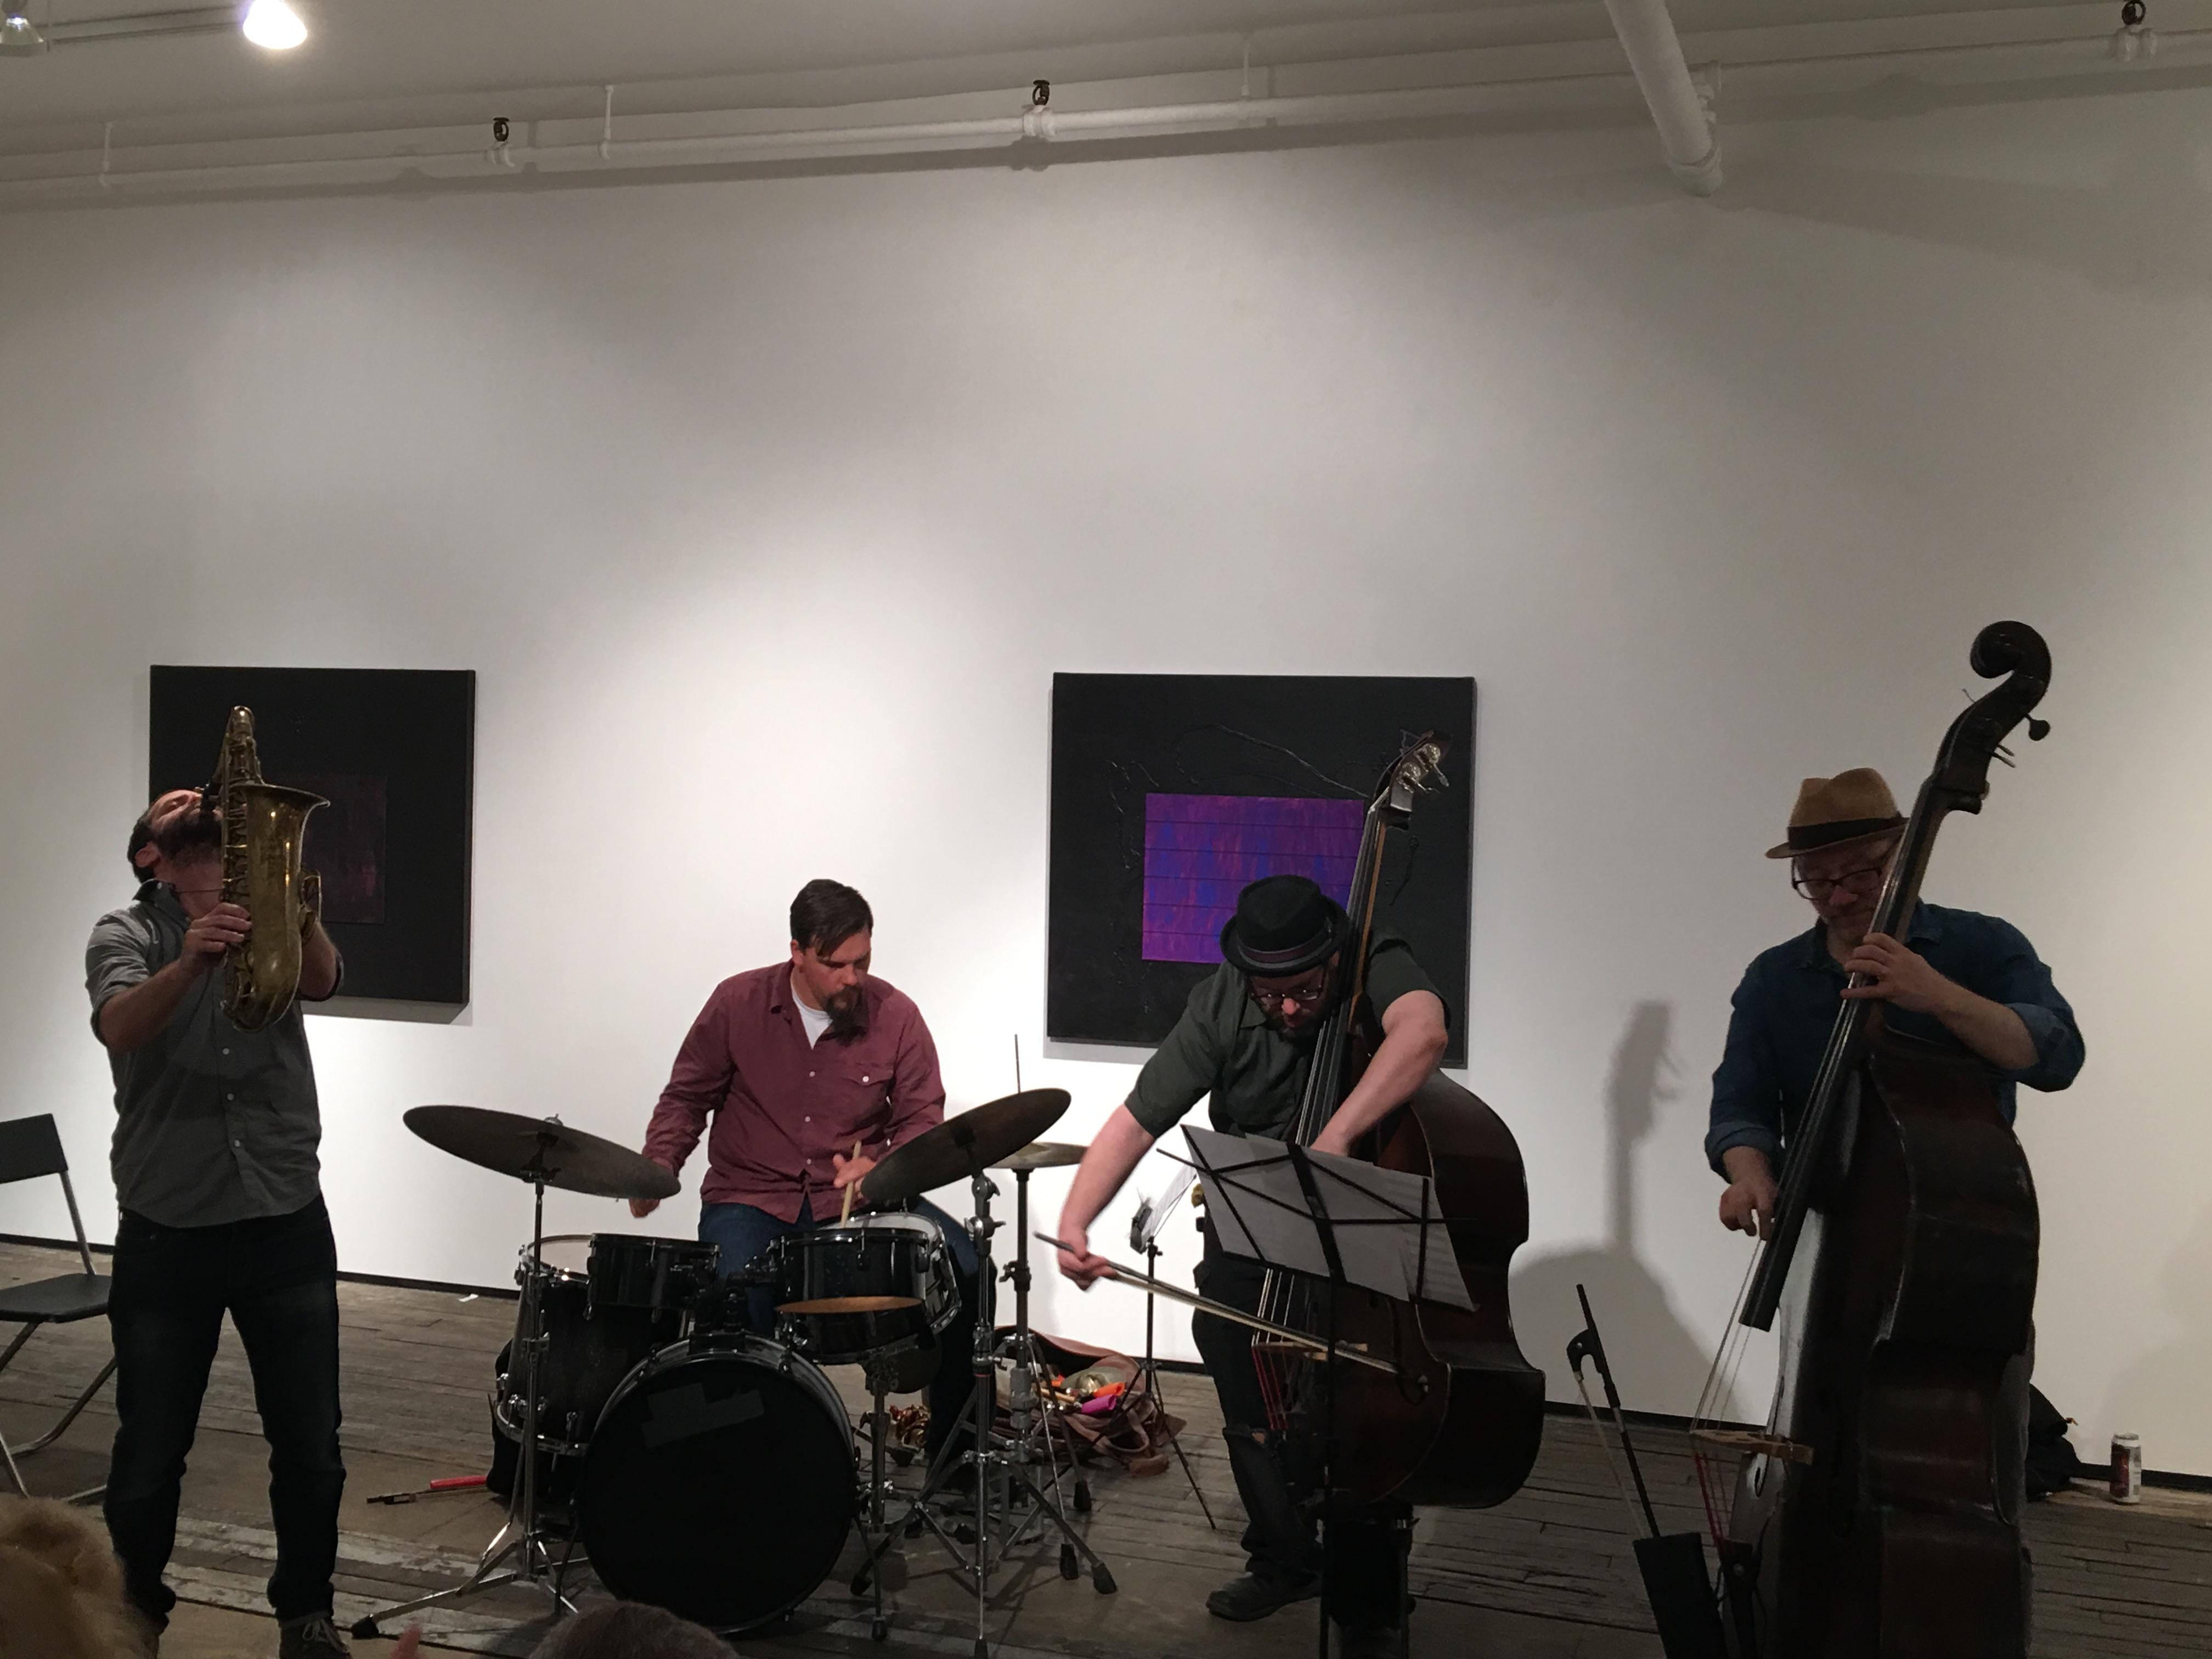 Concert Review: Yoni Kretzmer 2-Bass Quartet Live at the Zürcher Gallery, April 25